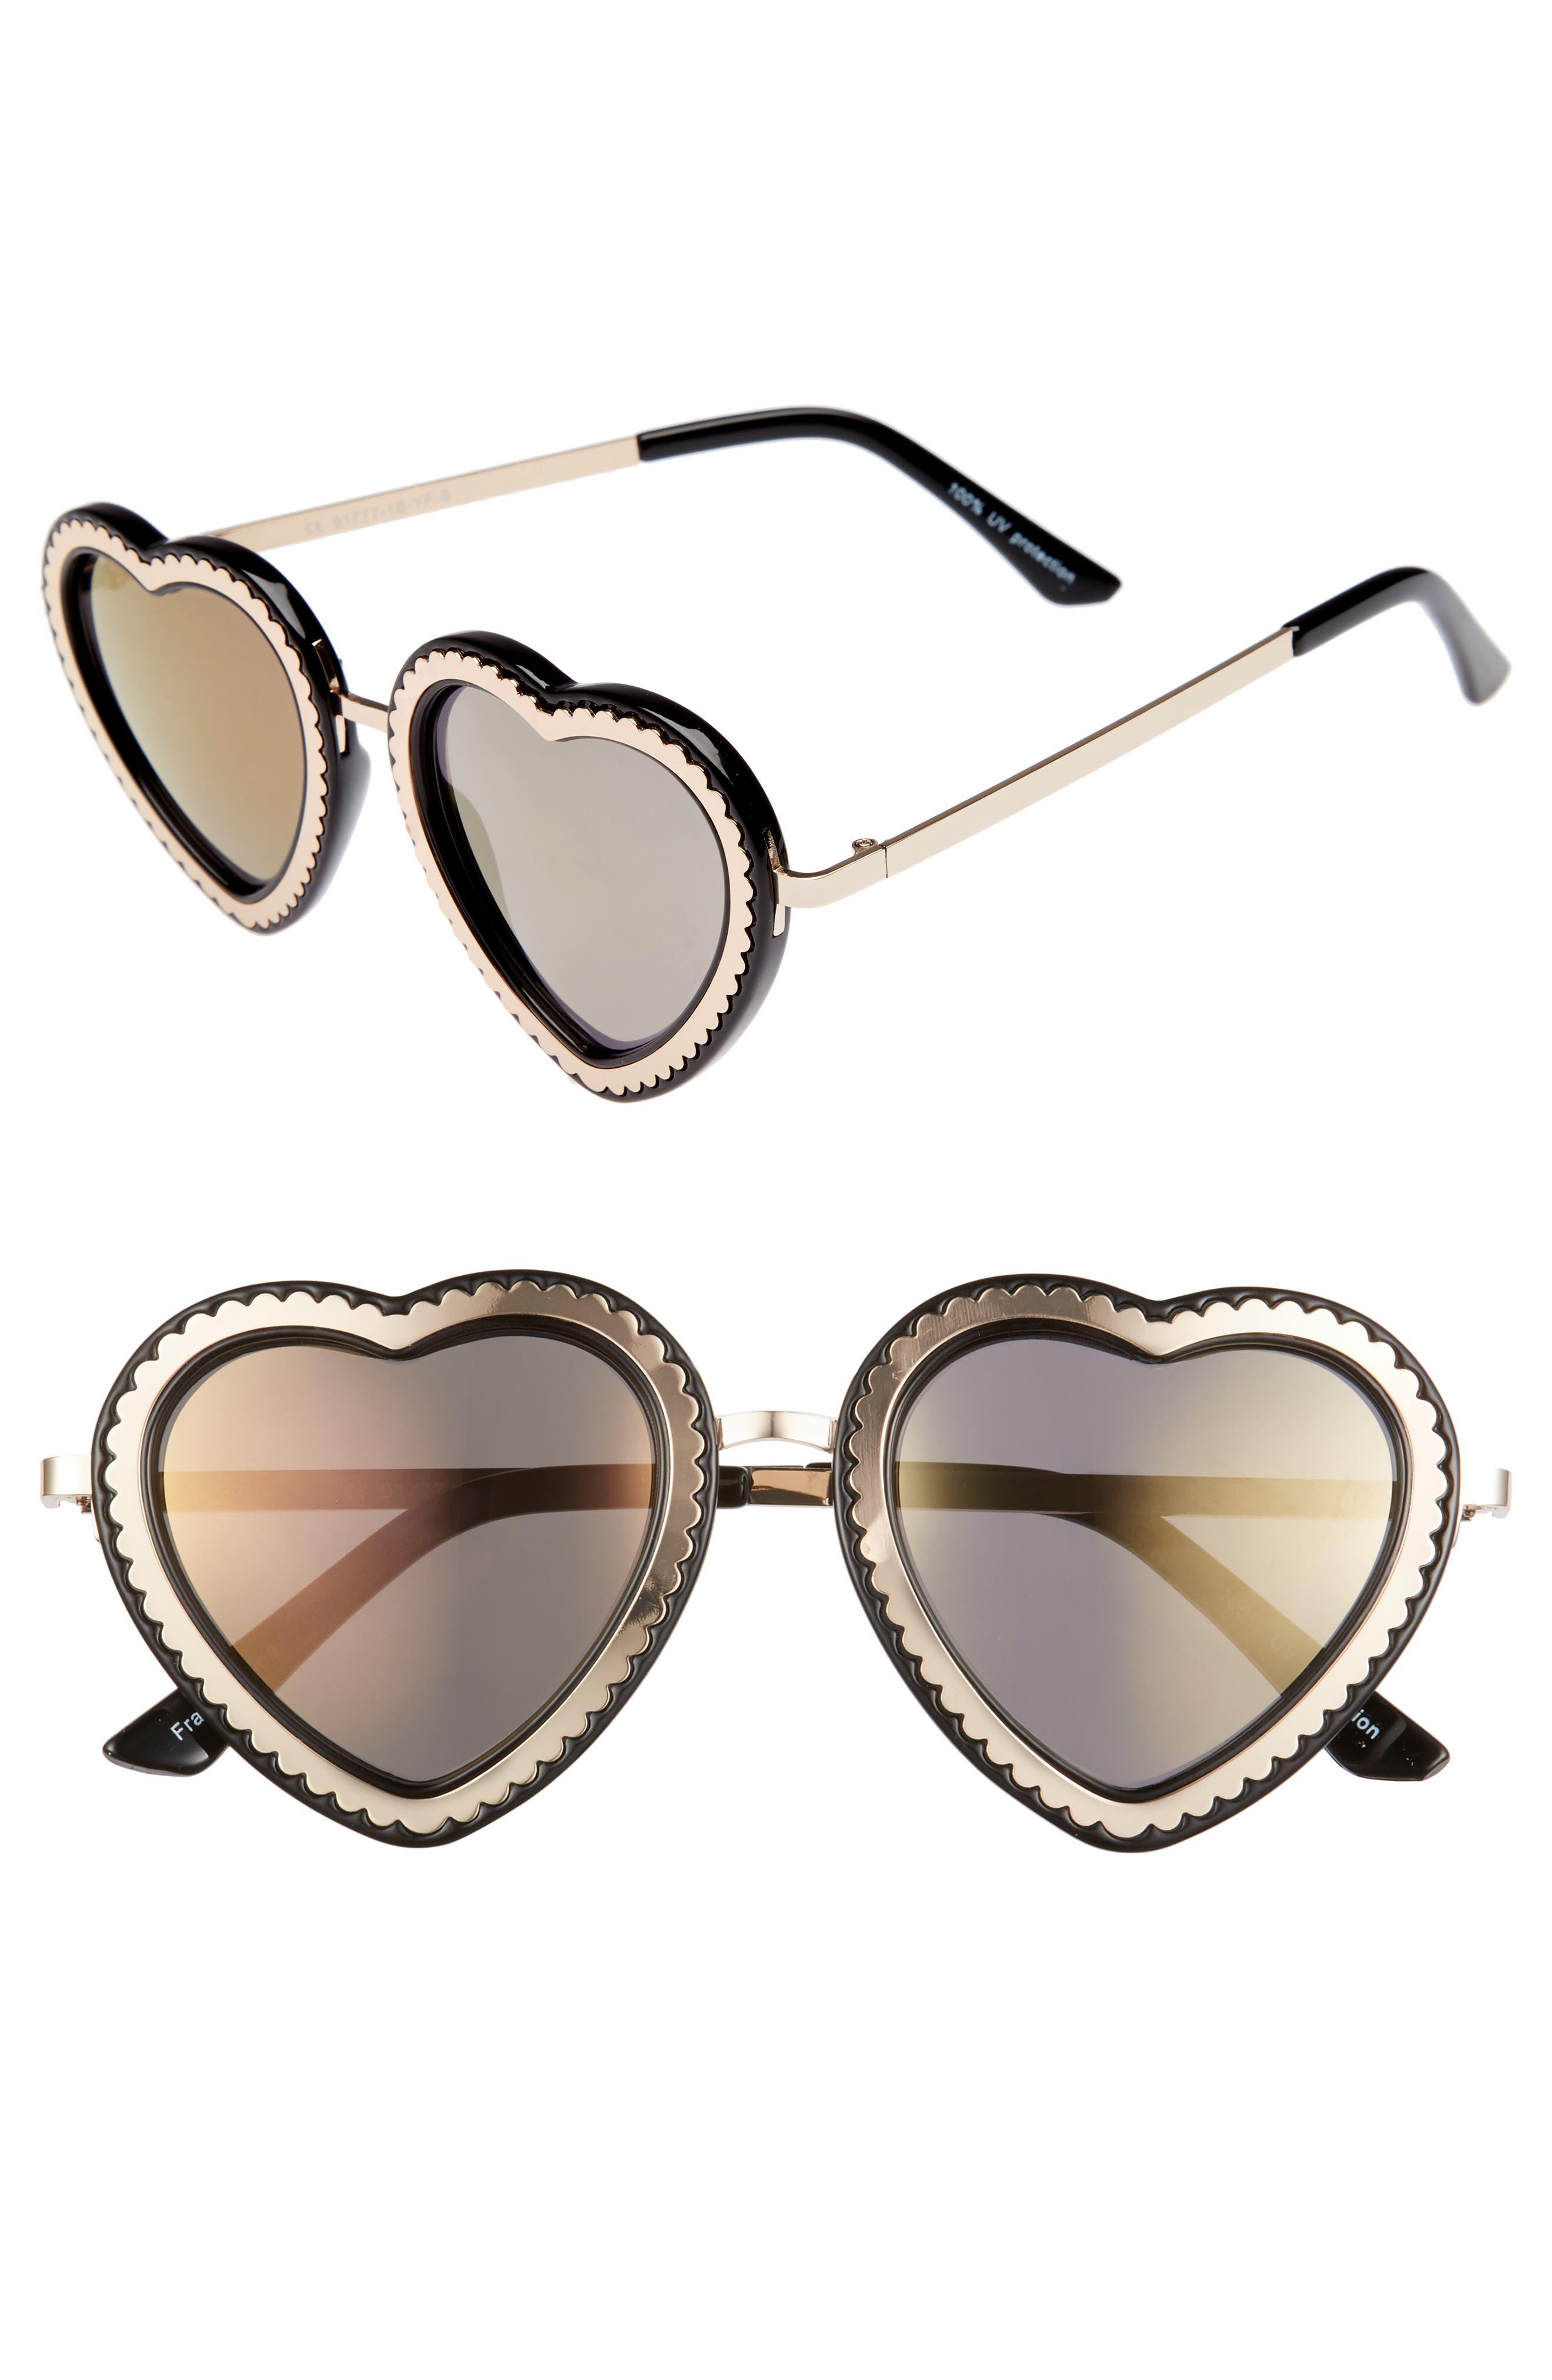 61mm Mirrored Heart Sunglasses,                         Main,                         color, Gold/ Black